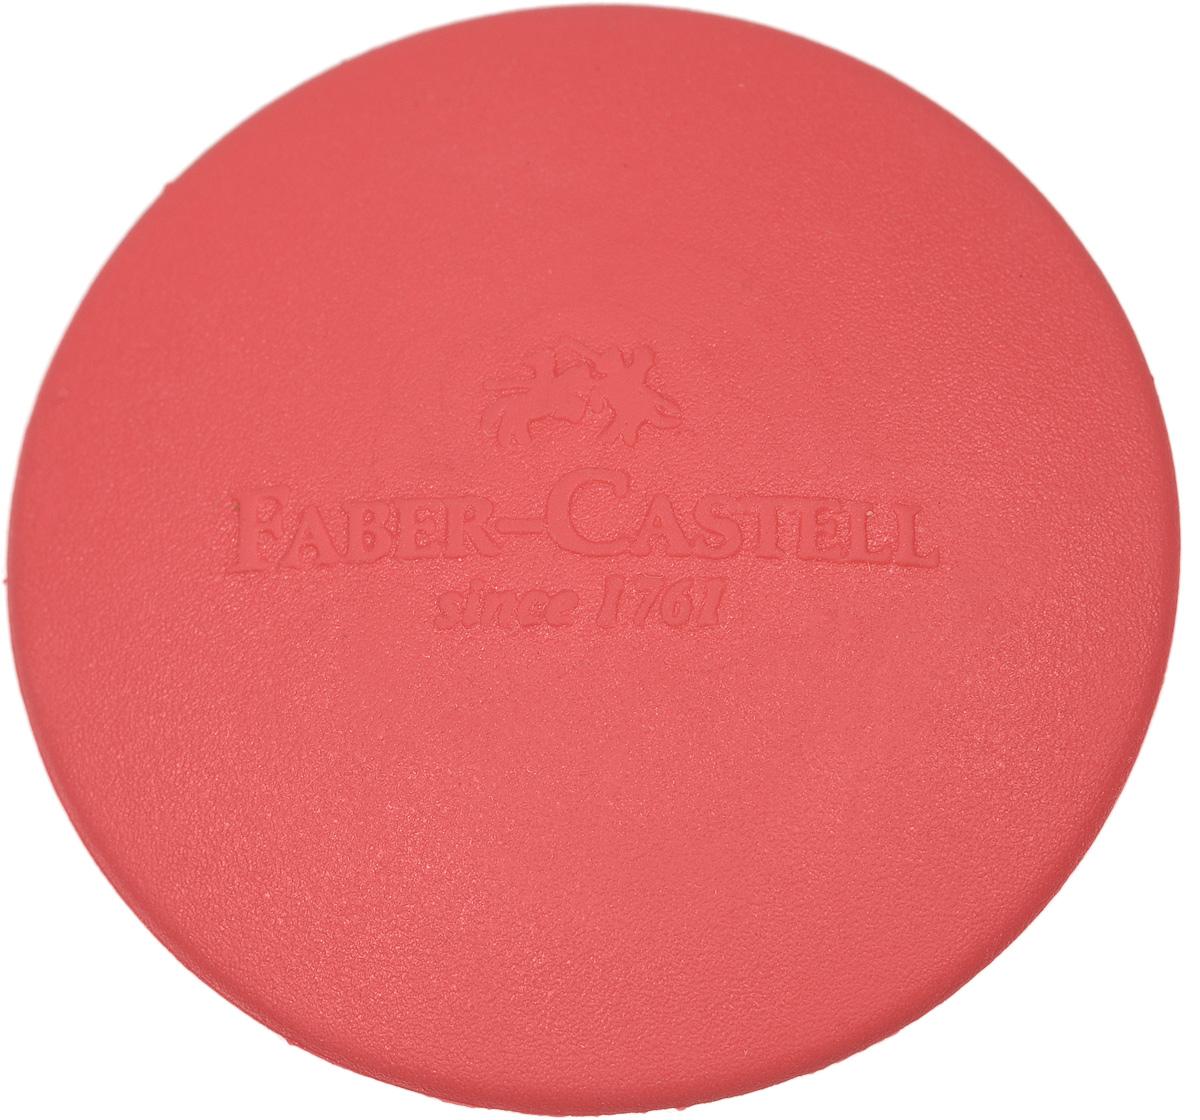 Faber-Castell Ластик цвет красный 589022_красный